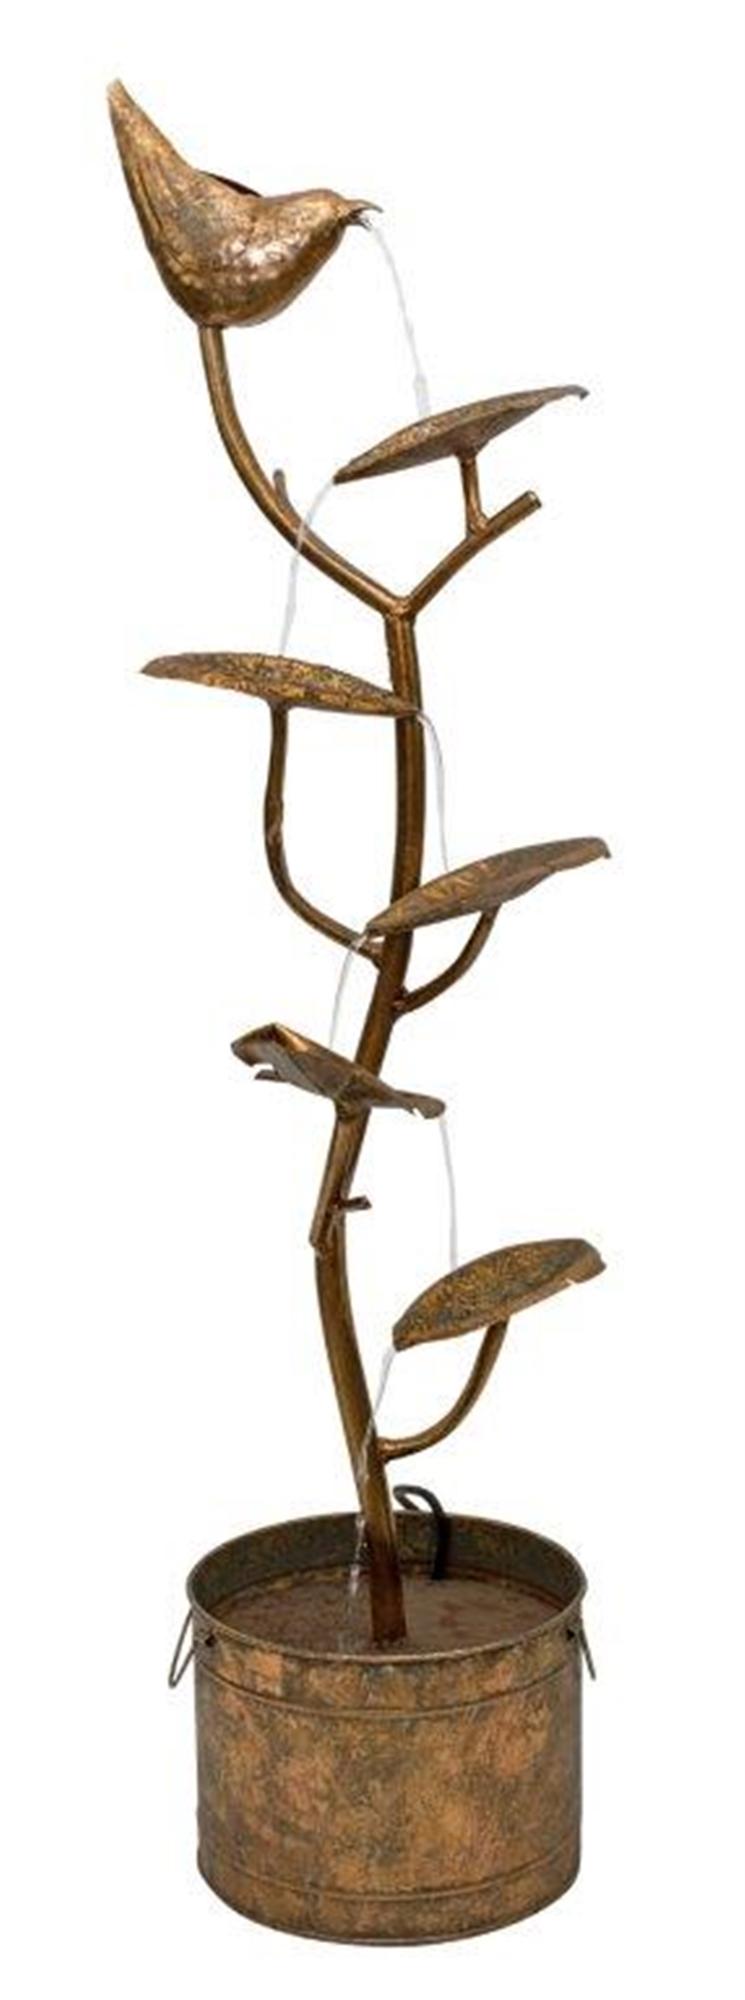 "Bird Fountain 14.5""L x 4'H Iron"